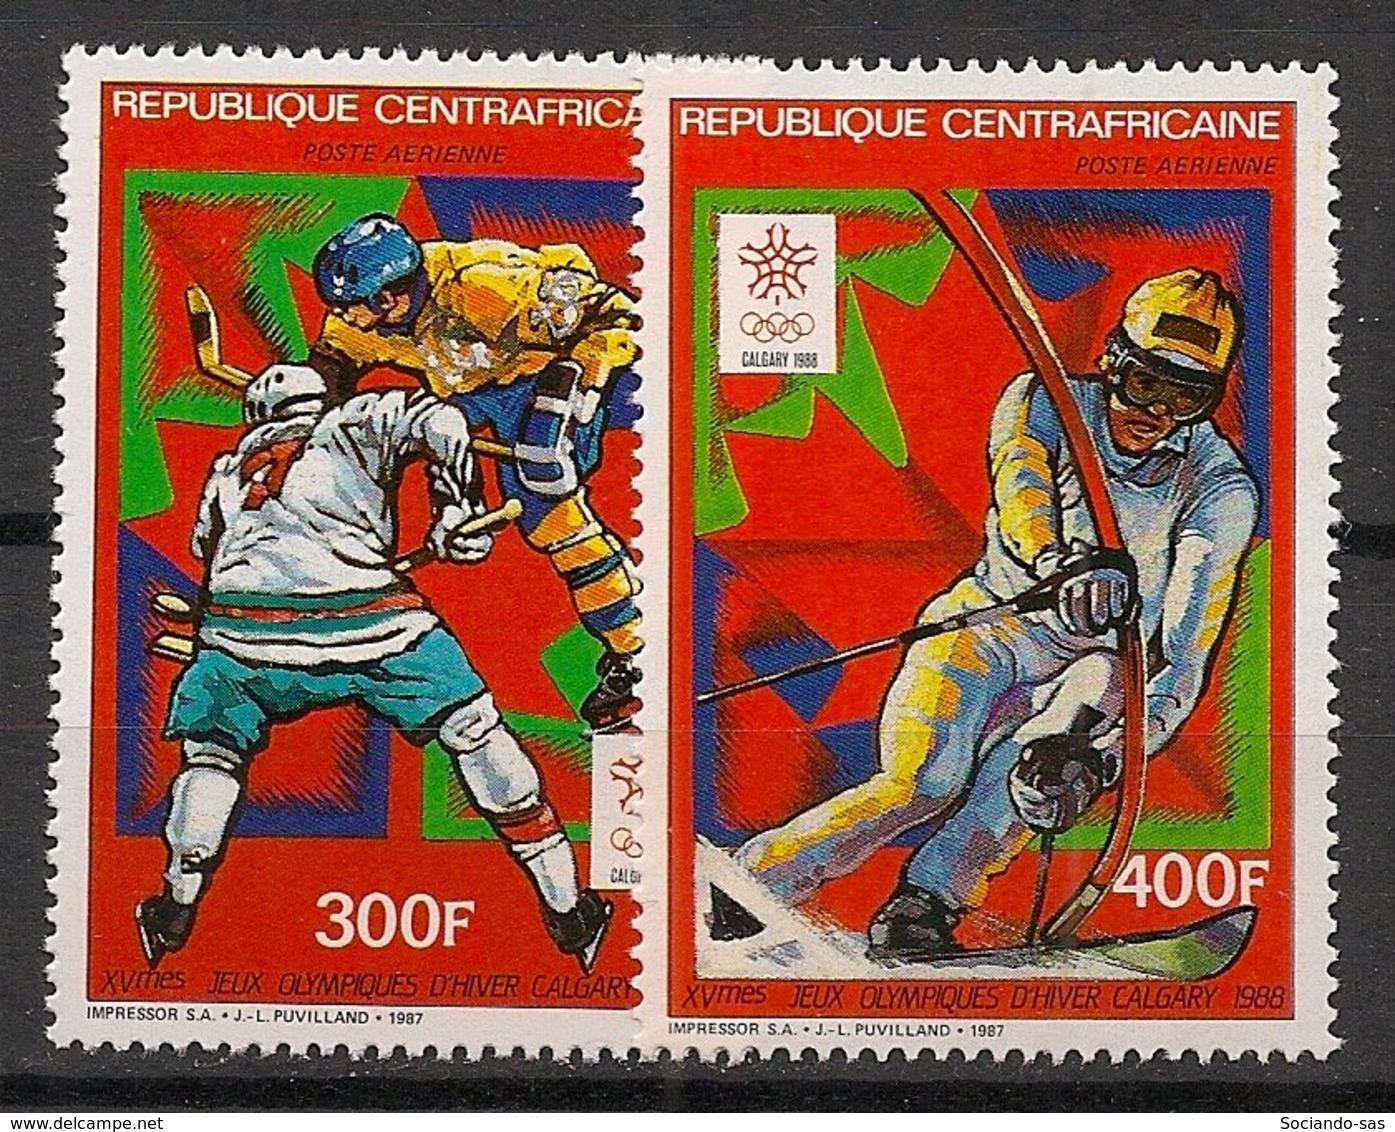 Centrafricaine - 1987 - Poste Aérienne PA N°Yv. 367 à 368 - Olympics Calgary 88 - Neuf Luxe ** / MNH / Postfrisch - Zentralafrik. Republik